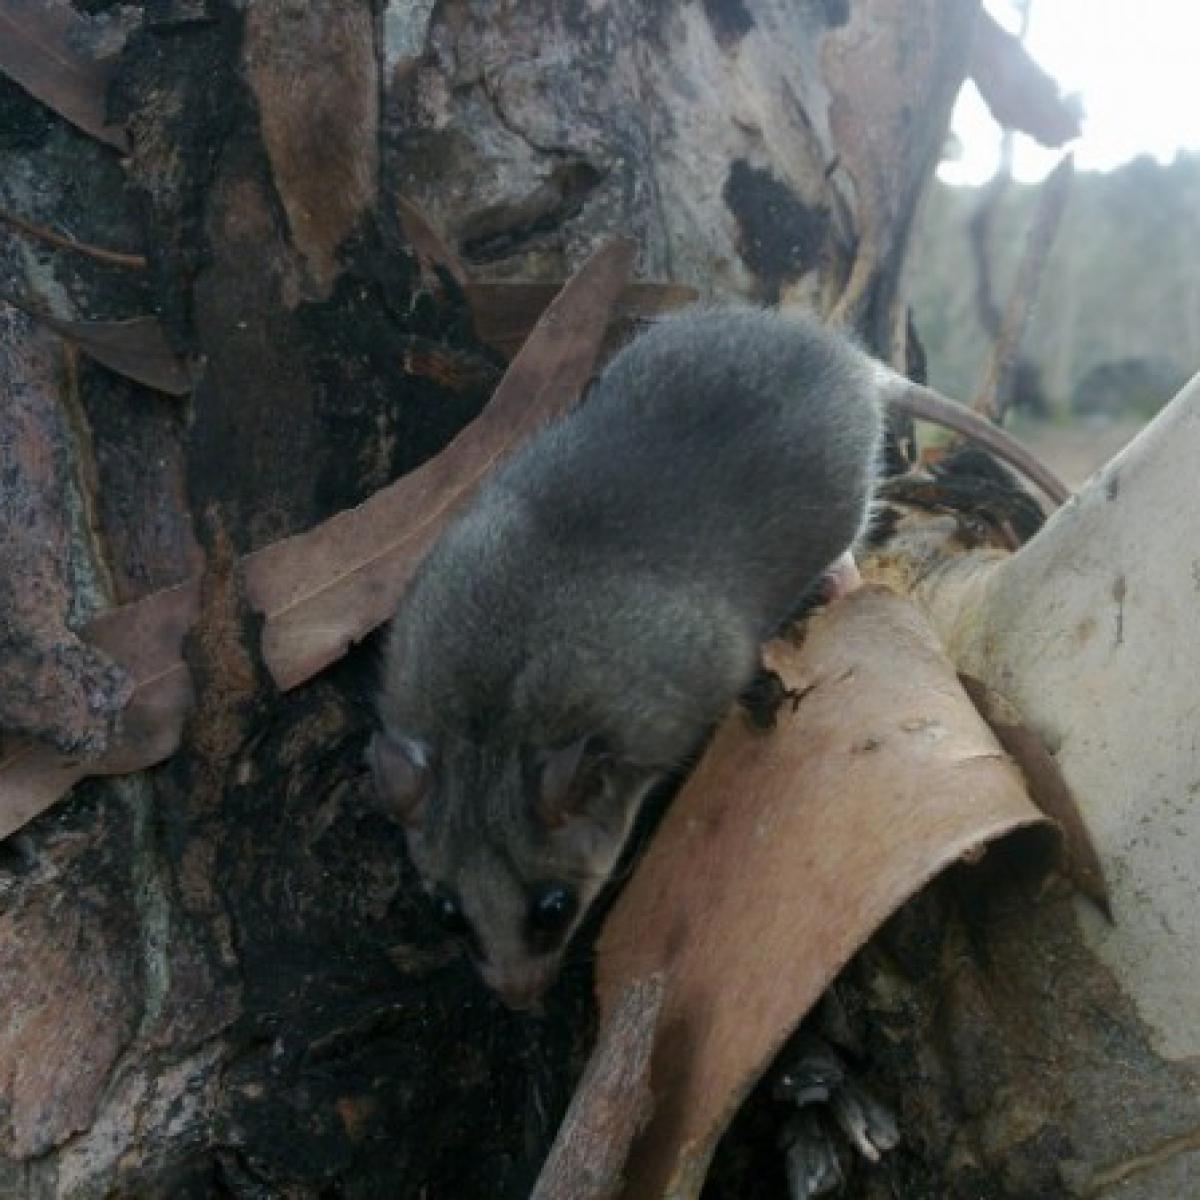 Eastern Pygmy Possum (Cercartetus nanus)